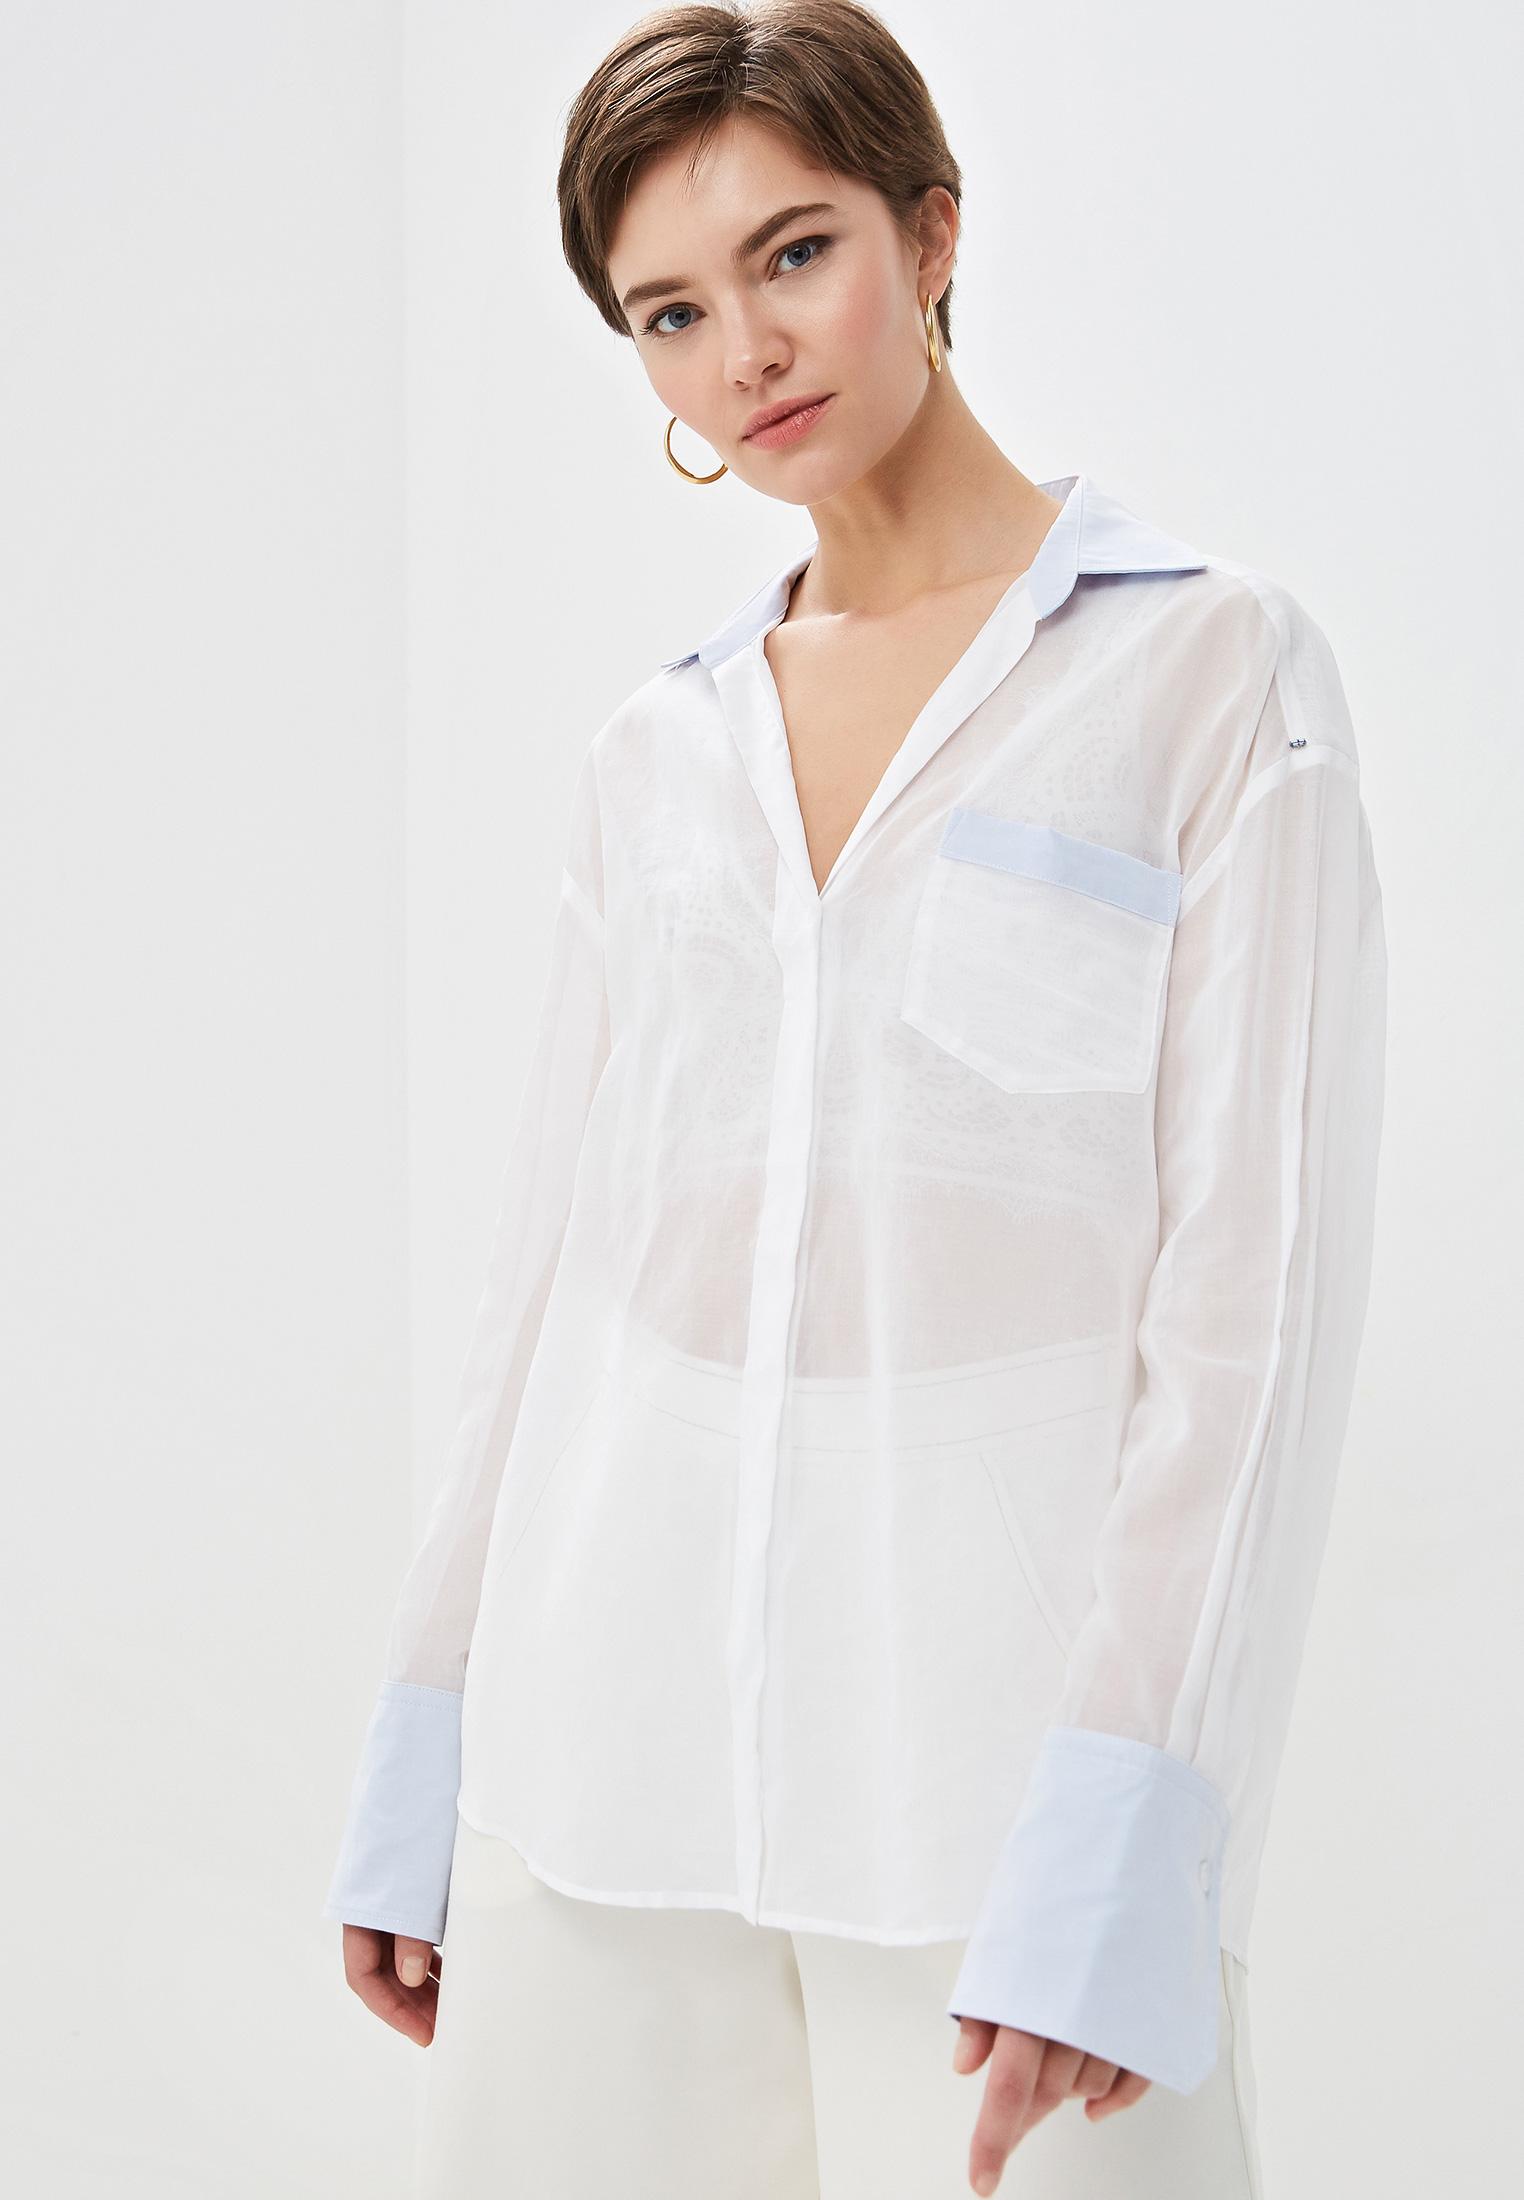 Женские рубашки с длинным рукавом Sportmax Code DOMEZ